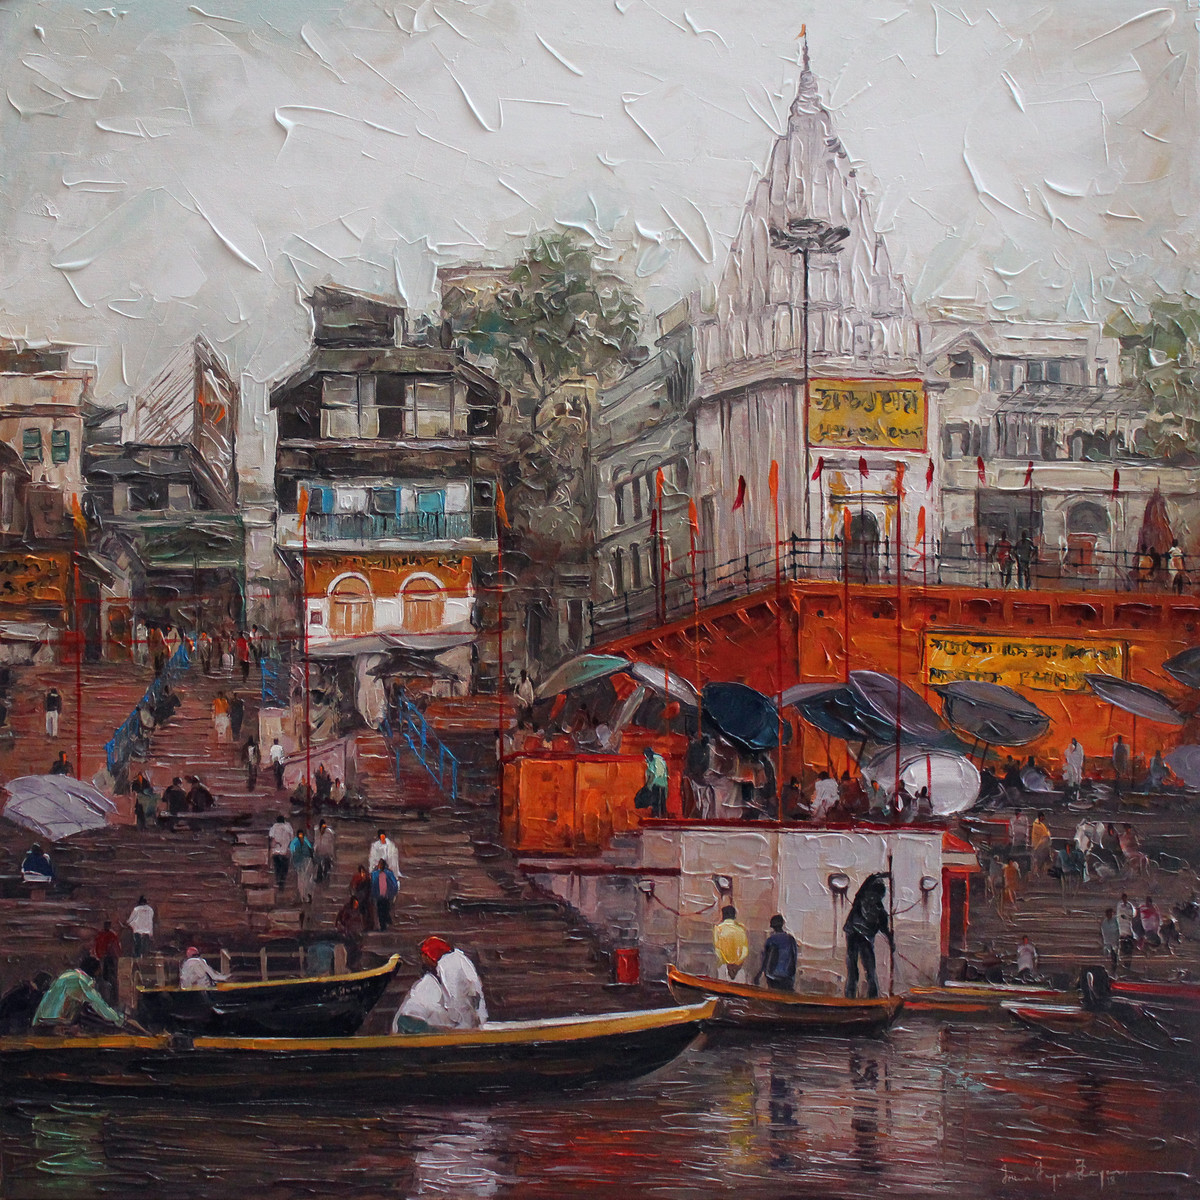 Varanasi_03 by Iruvan Karunakaran, Expressionism Painting, Acrylic on Canvas, Brown color